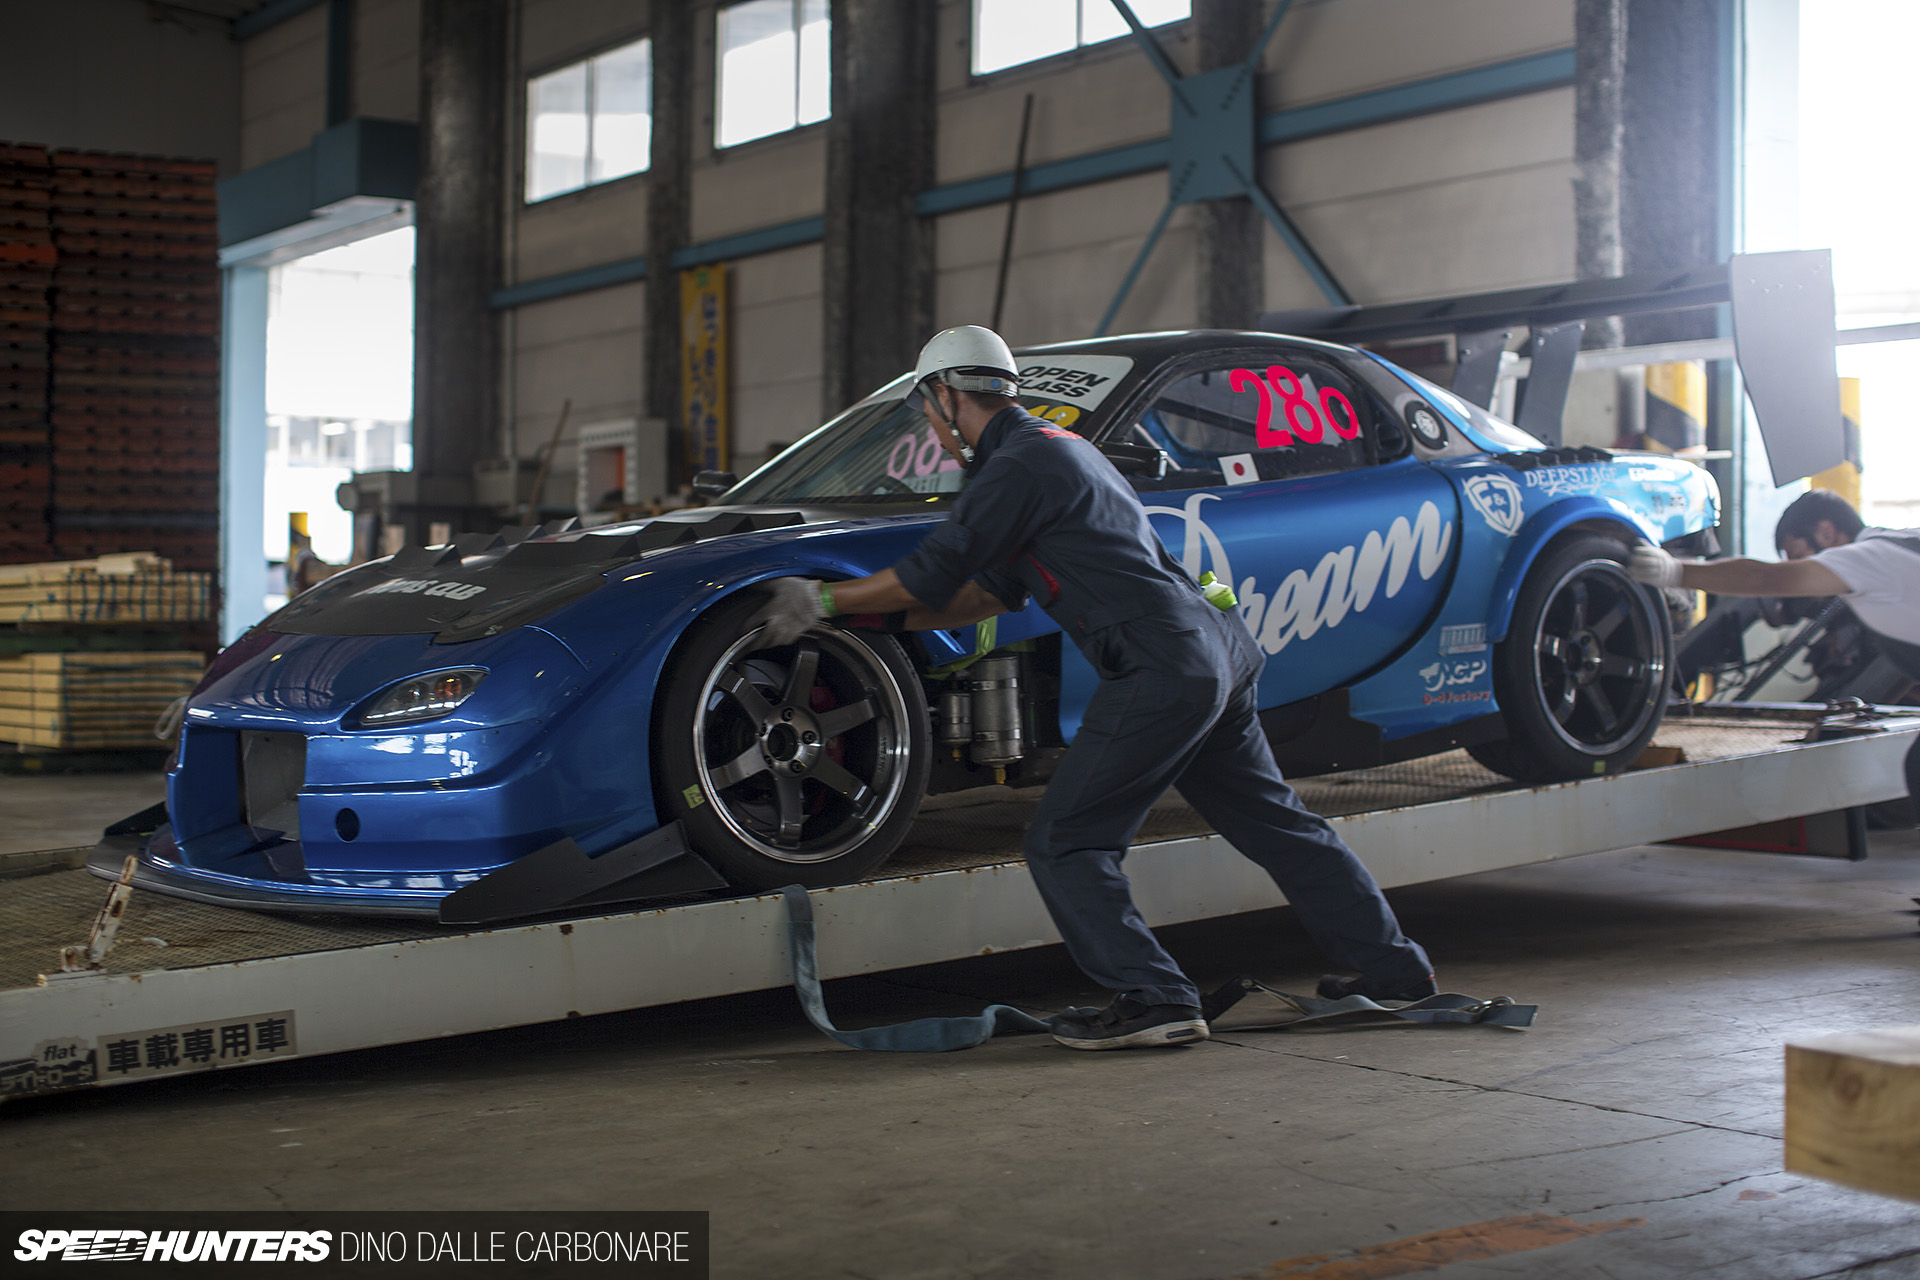 [Image: wtac2017_cars_honmoku_dino_dalle_carbonare_18.jpg]